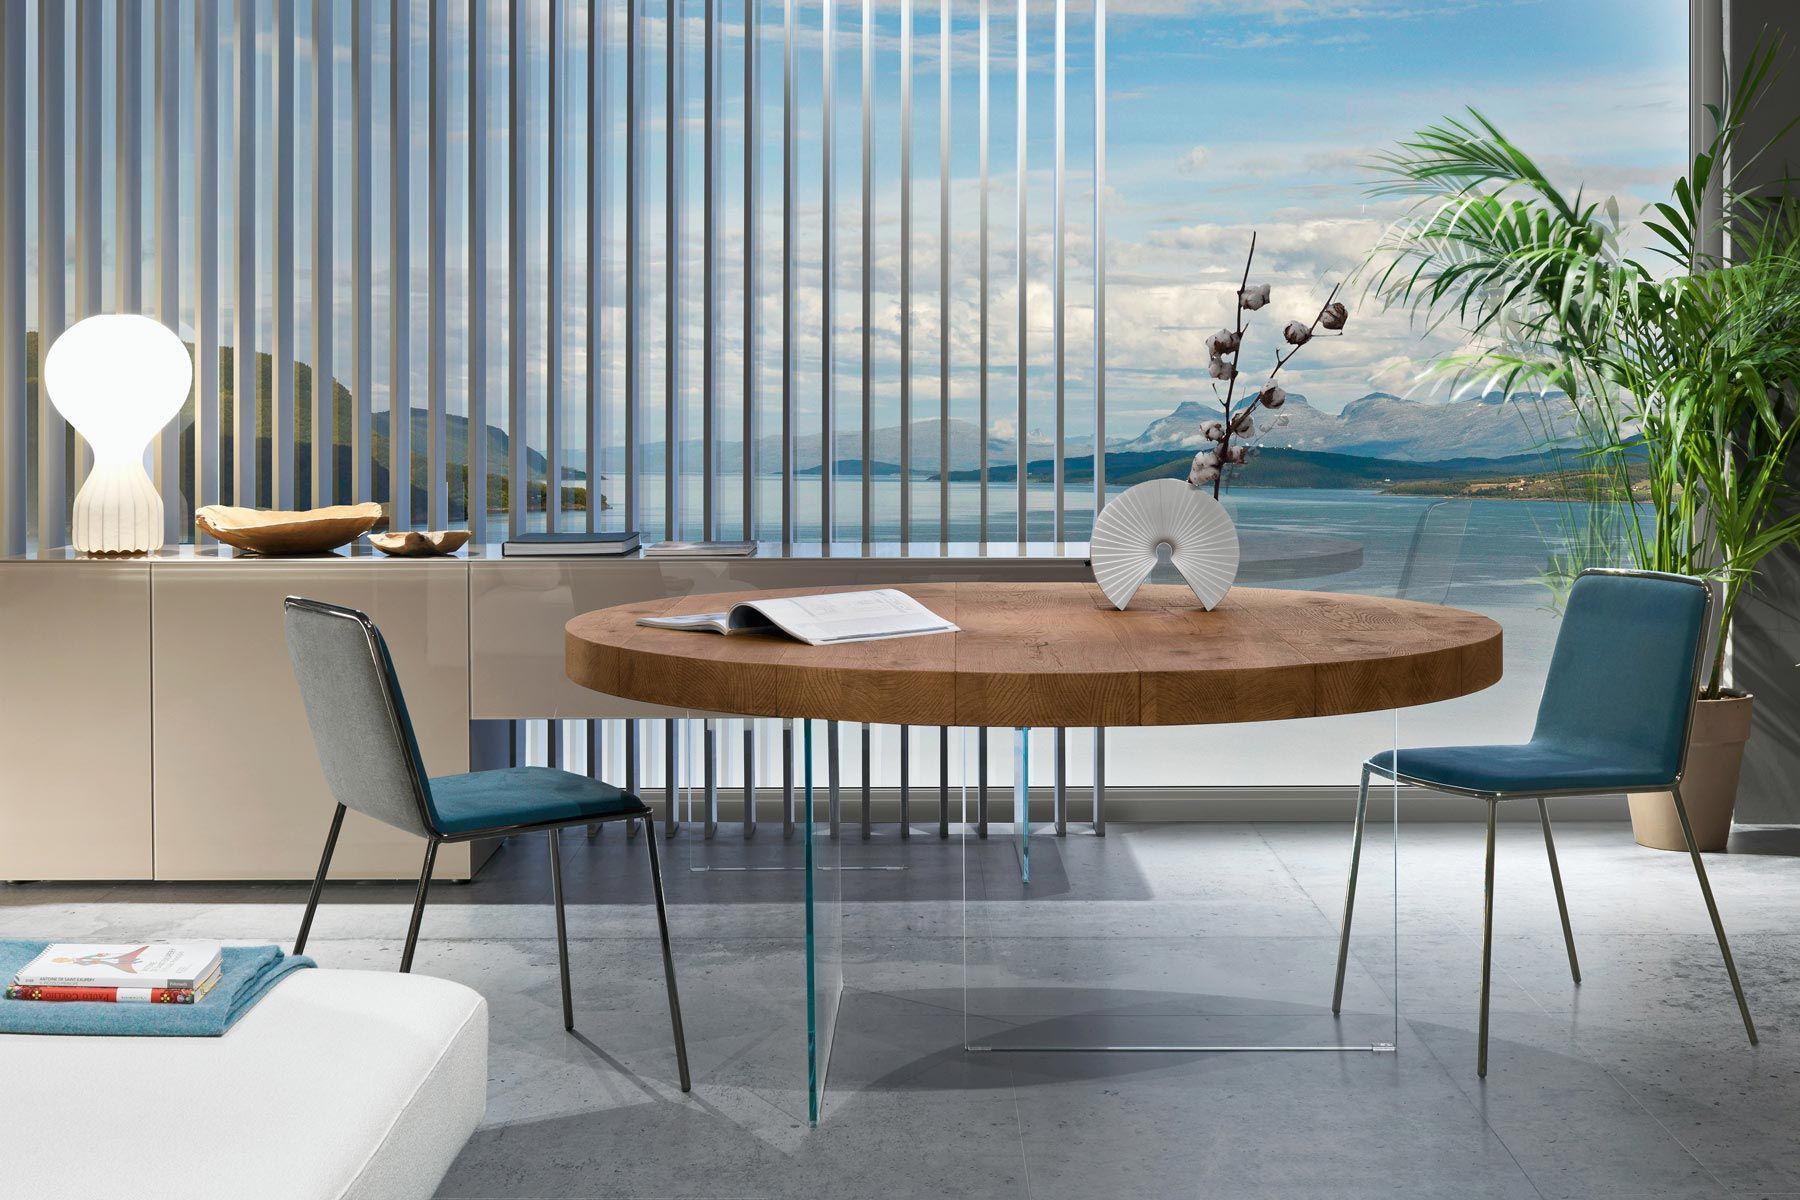 Tavolo Lago Air.Tavolo Air Gem Wooden Dining Table Designs Wooden